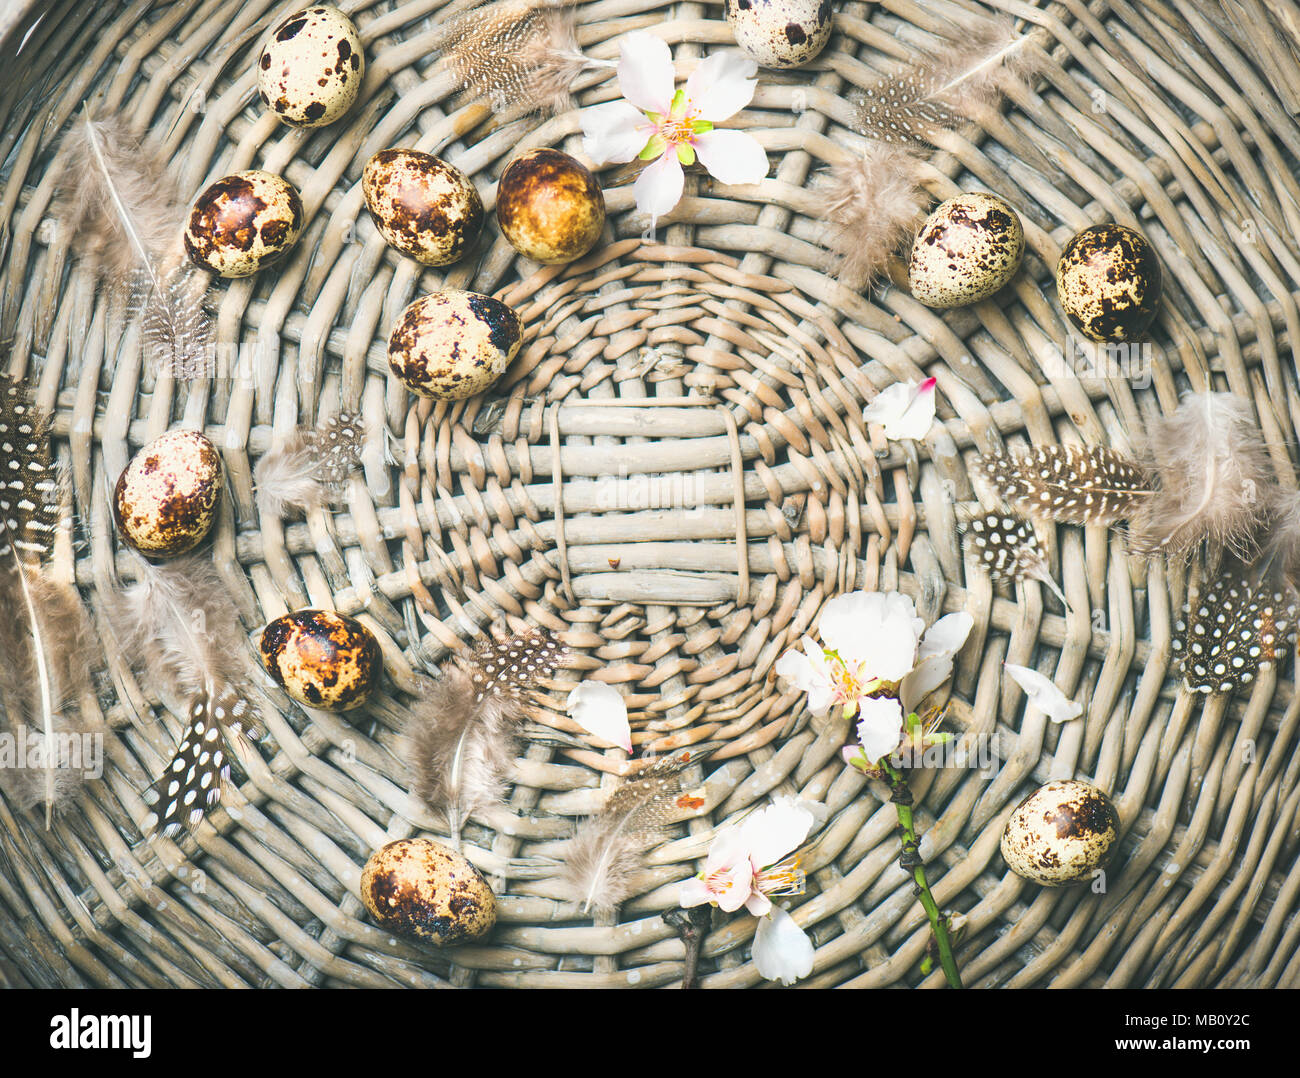 Huevos de codorniz en color natural con flores de Pascua Imagen De Stock